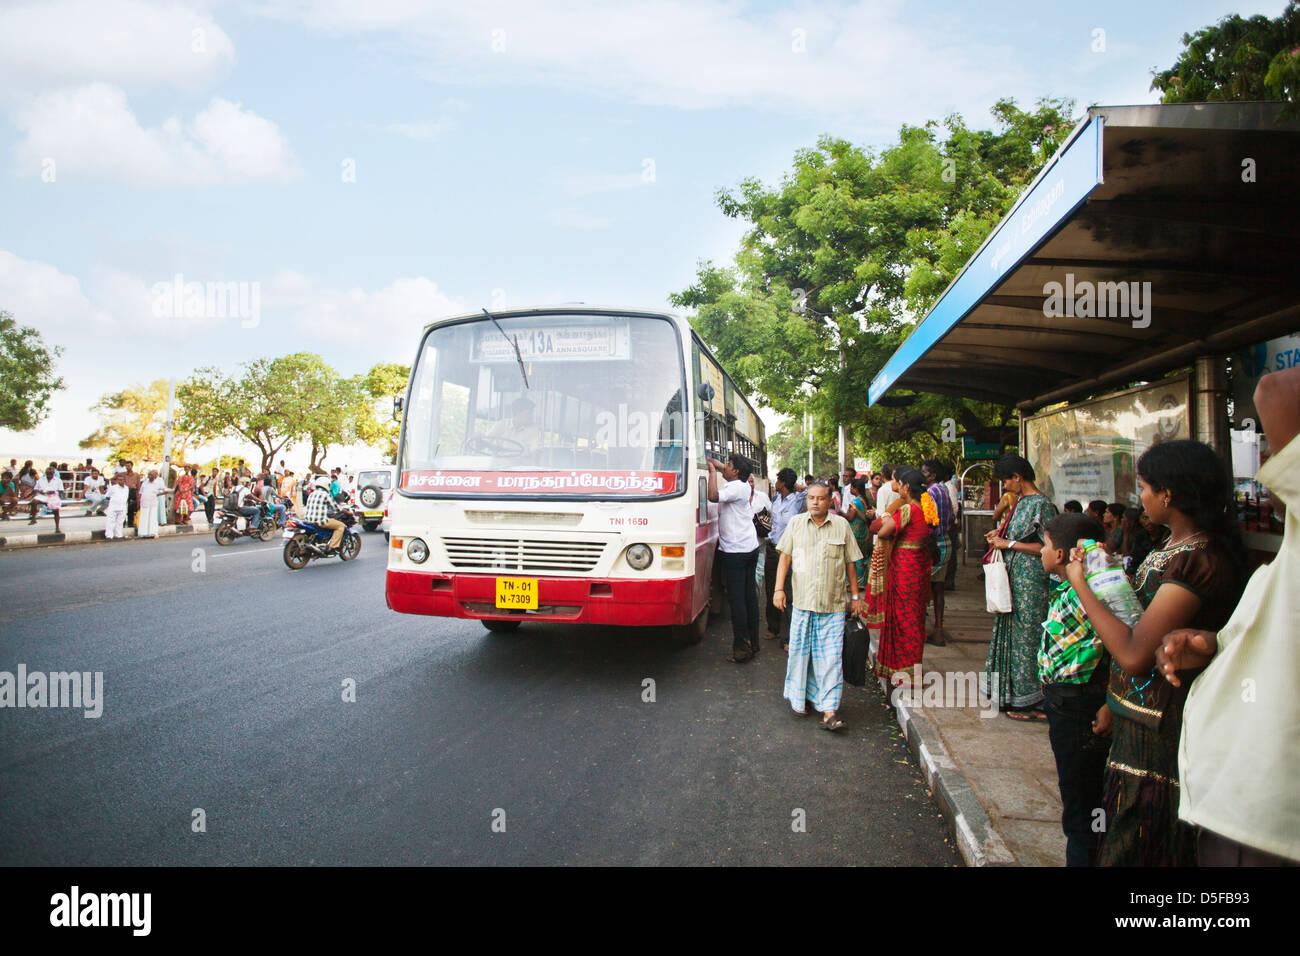 India Bus Stop Stock Photos & India Bus Stop Stock Images - Alamy